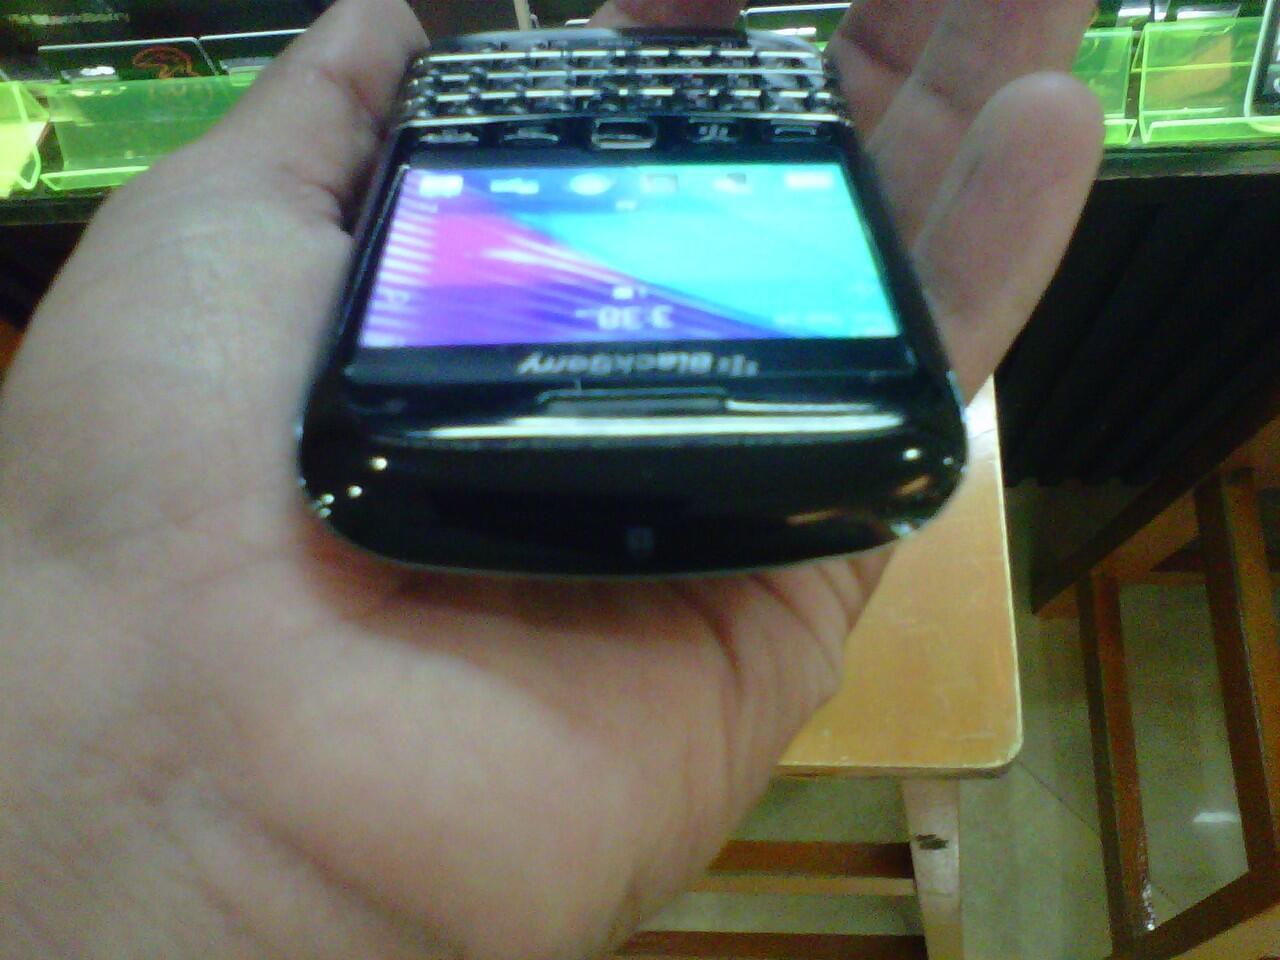 Blackberry Bold 9790 Second Mulus LKP Kondisi 95% Mulus Masih Garansi Berindo